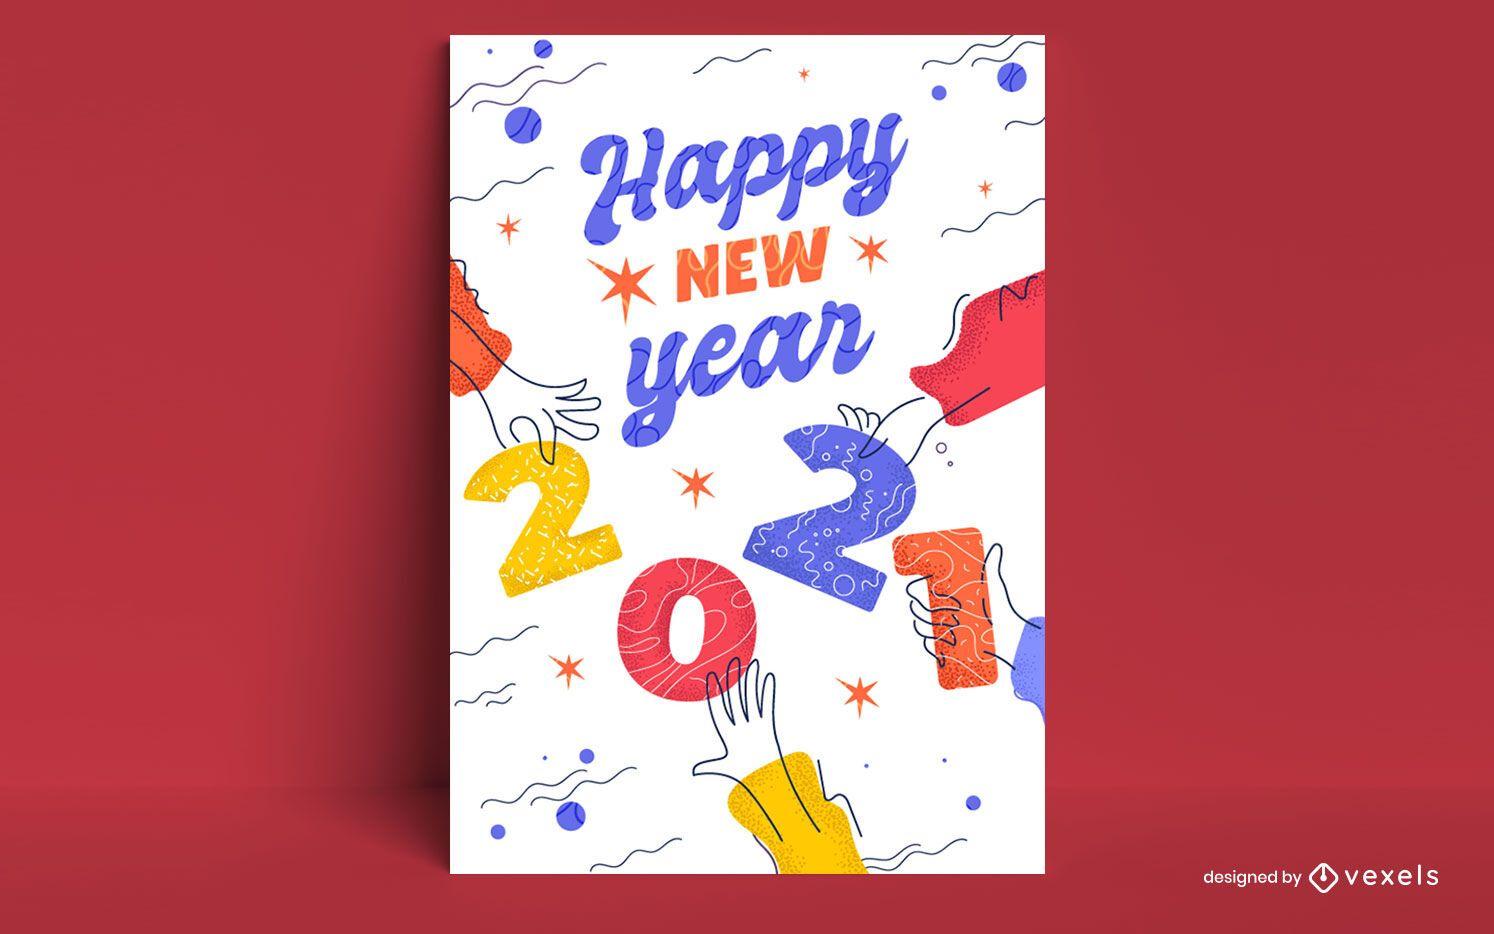 New year 2021 card design